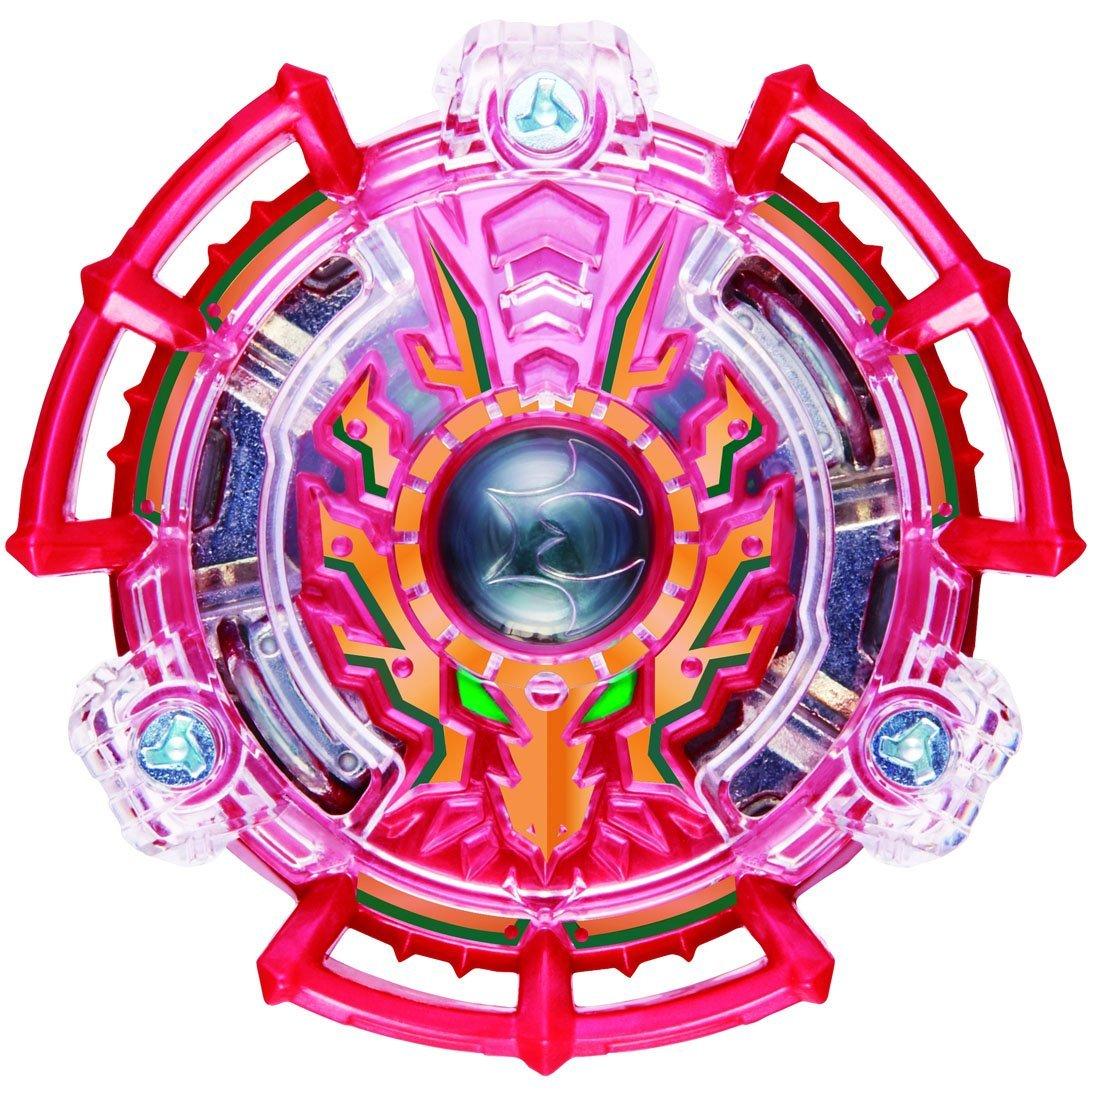 Evipero E2 Gravity Atomic Beyblade Wiki Fandom Powered